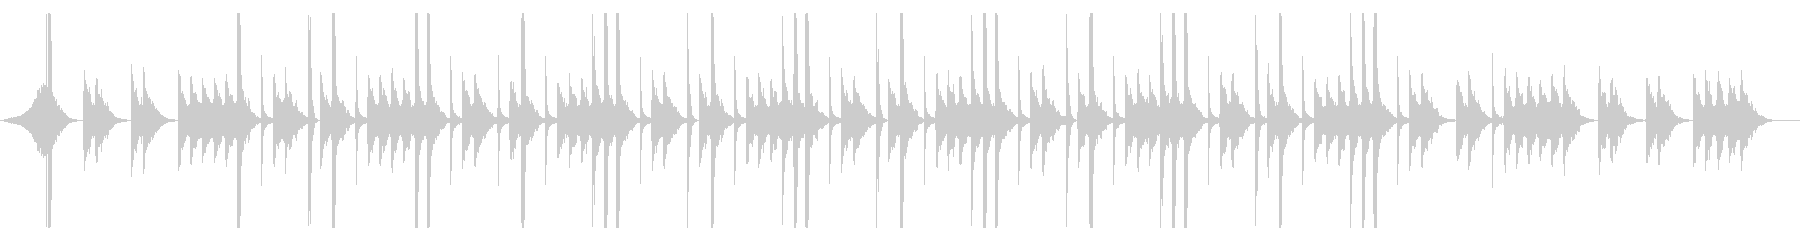 Pluck!!のオフボーカル版の未再生の波形